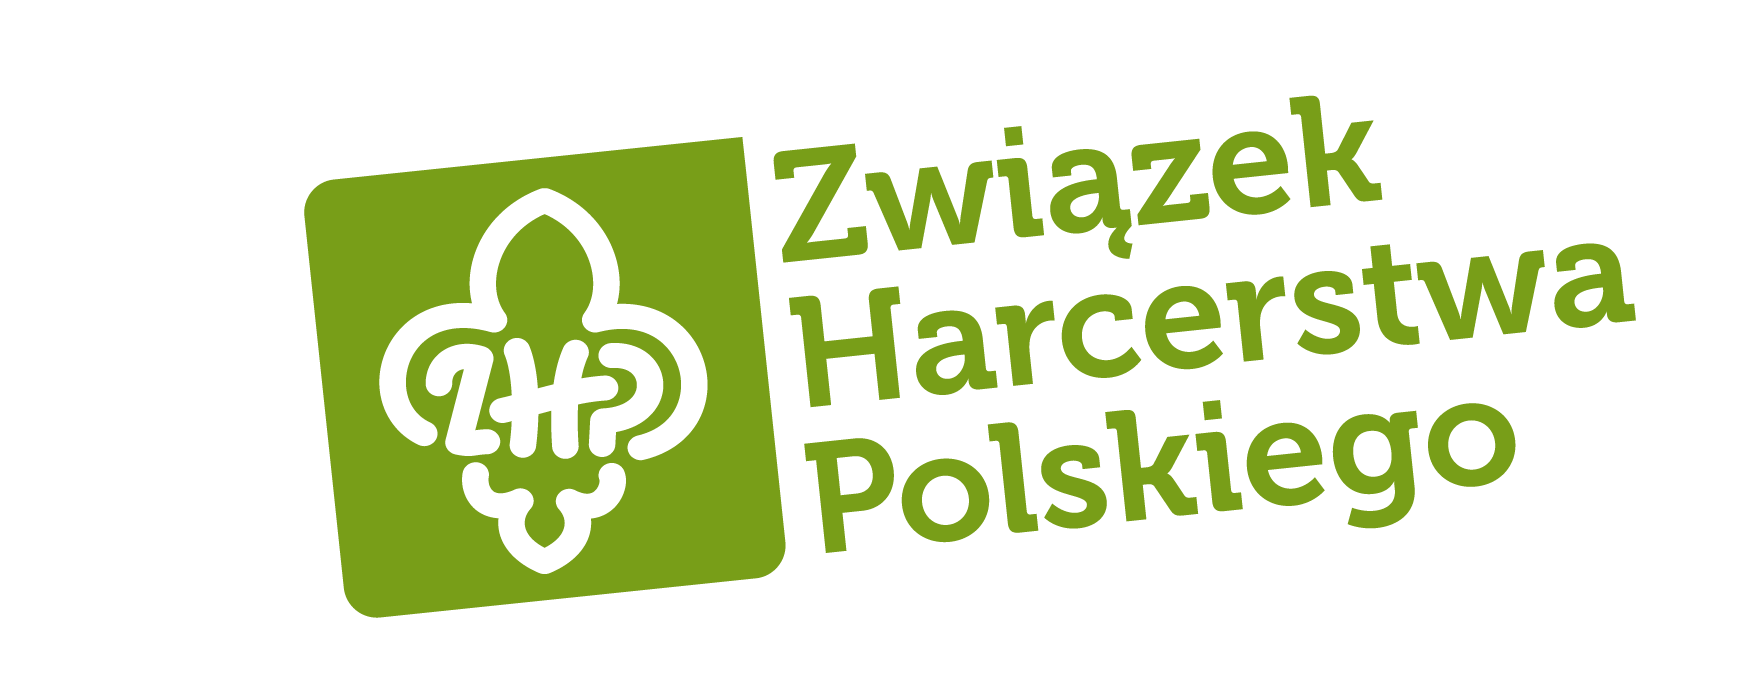 http://zhp.pl